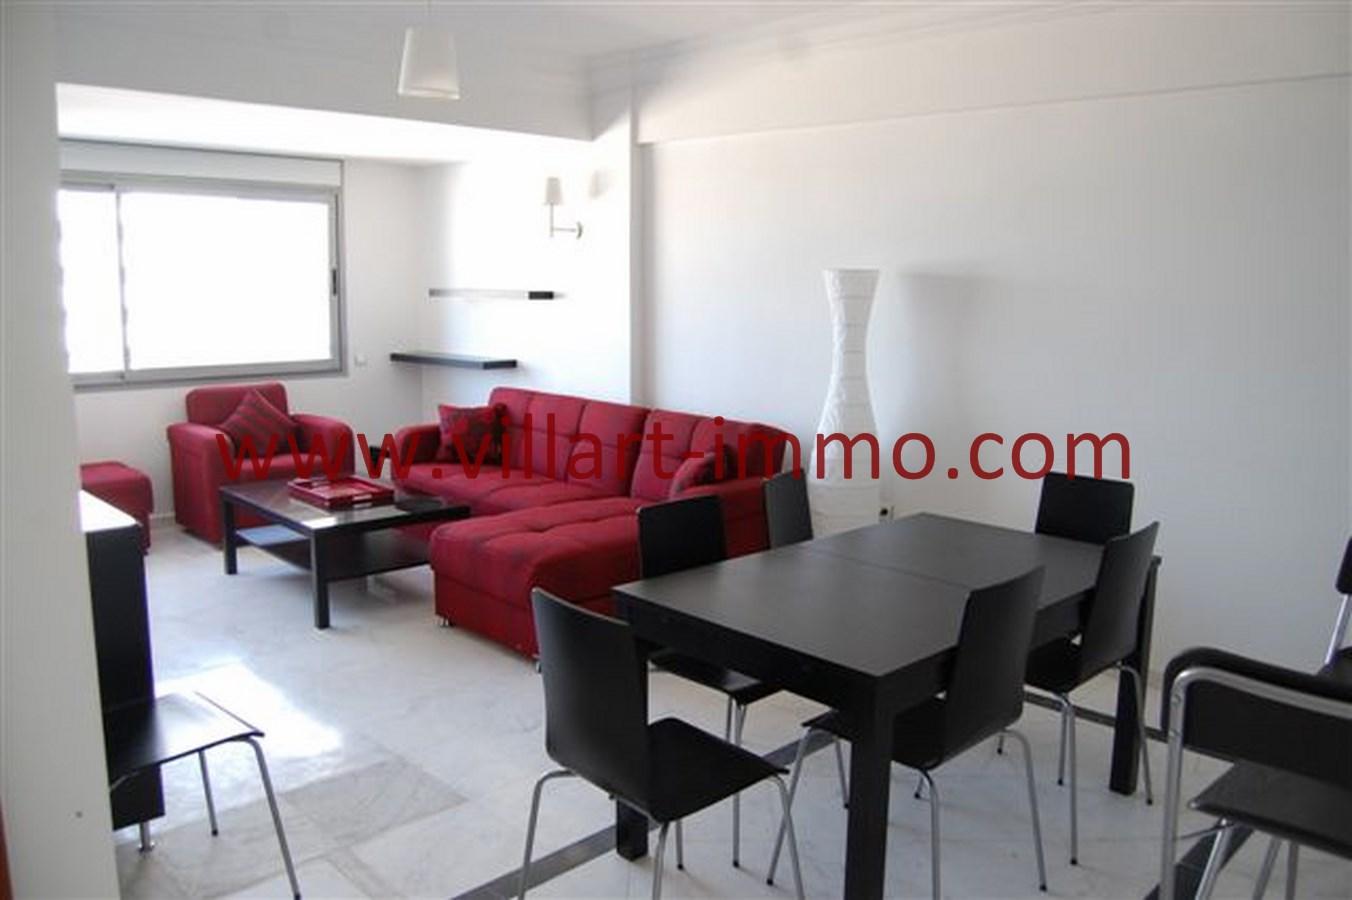 1-vente-appartement-tanger-centre-de-ville-salon-1-va463-villart-immo